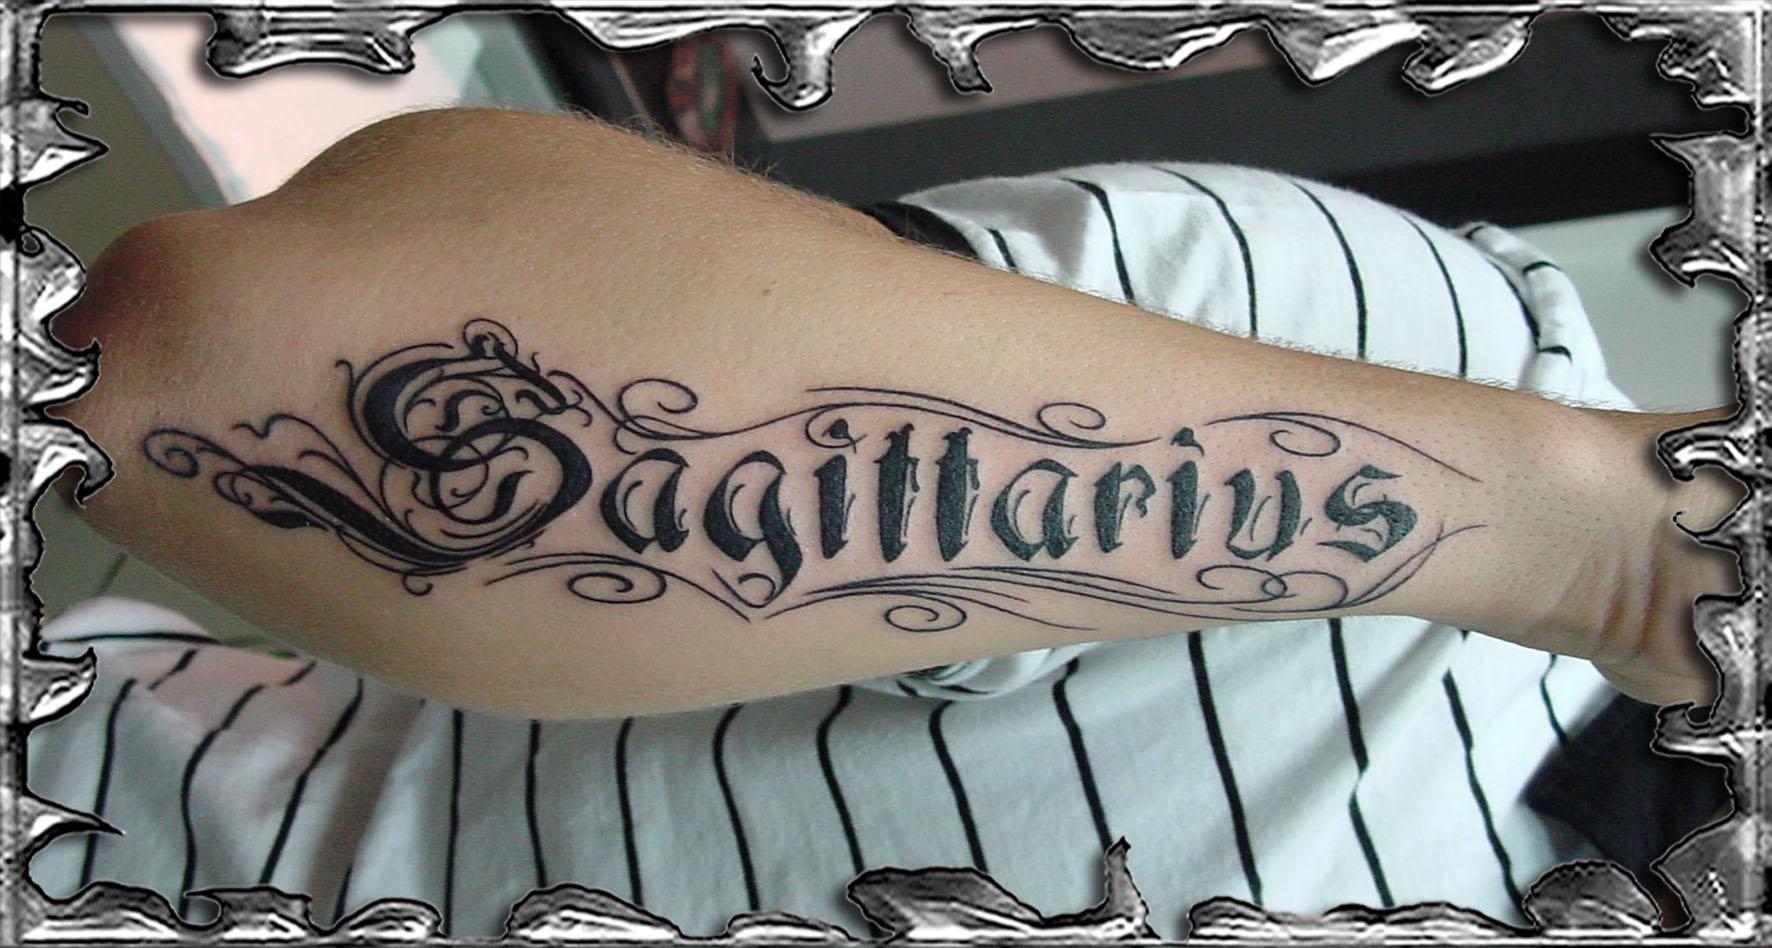 Top Tatouage Motif Arc Images For Pinterest Tattoos